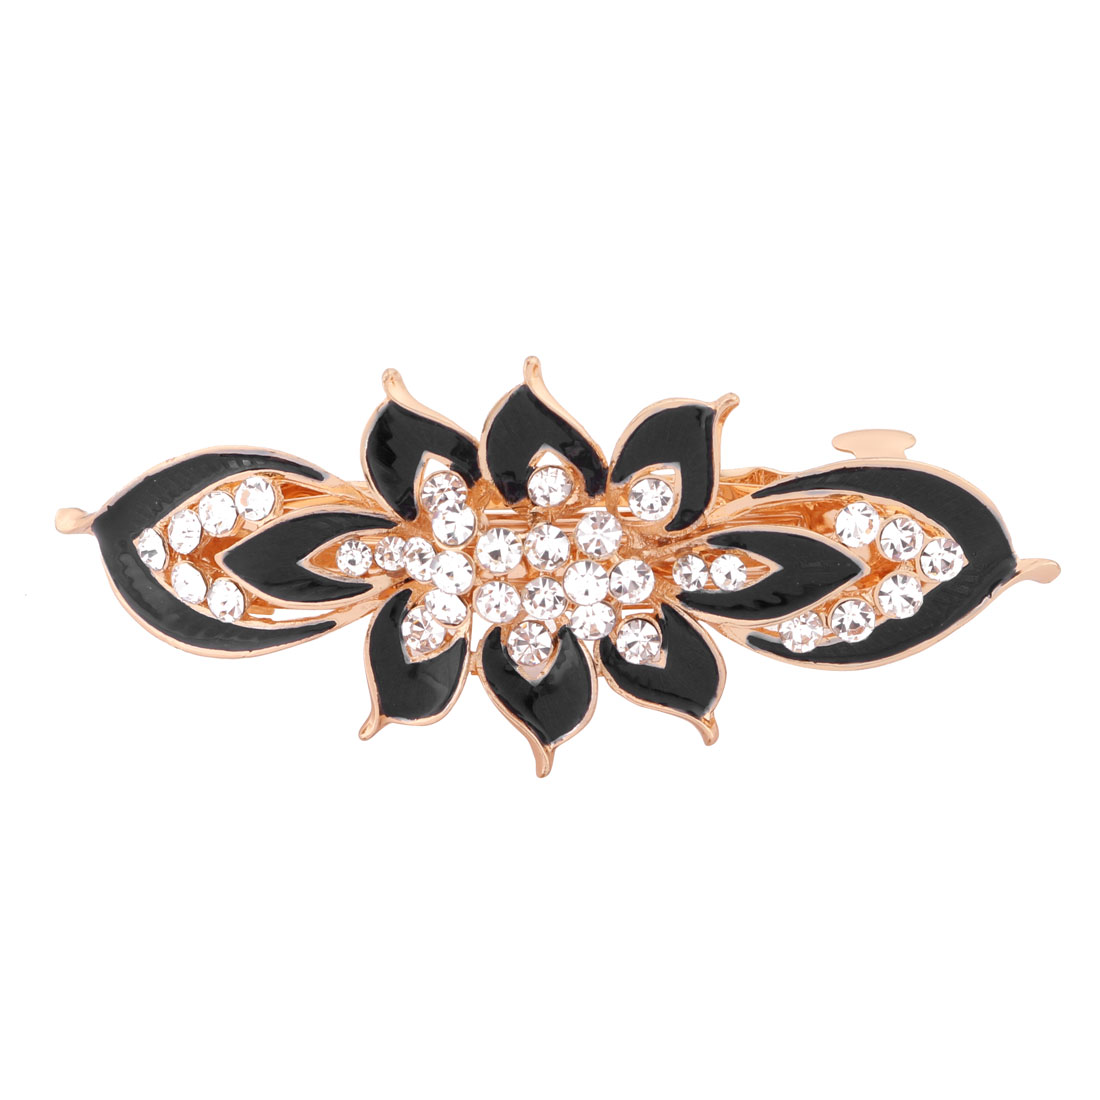 Women Metal Flower Design Faux Rhinestones Inlaid Hair Clip Barrette Hairpin Black